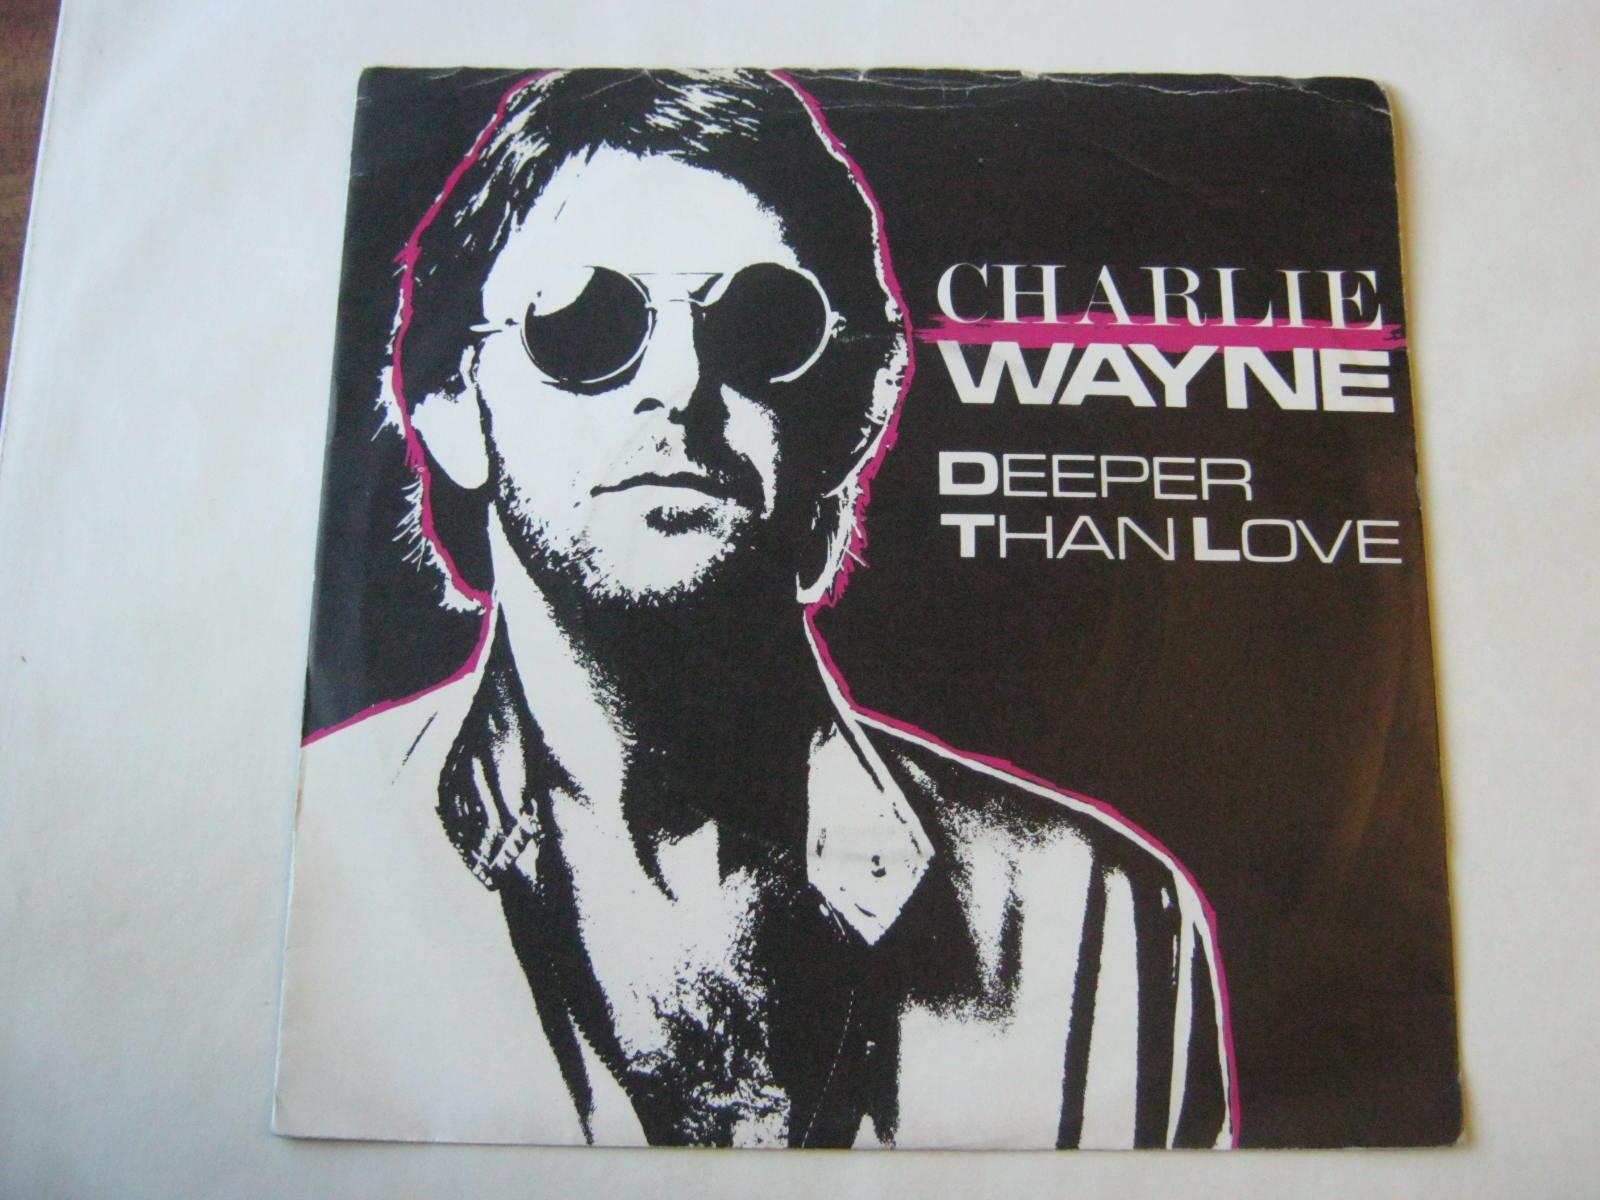 CHARLIE WAYNE - Deeper Than Love/Midnight Blue - 7inch x 1